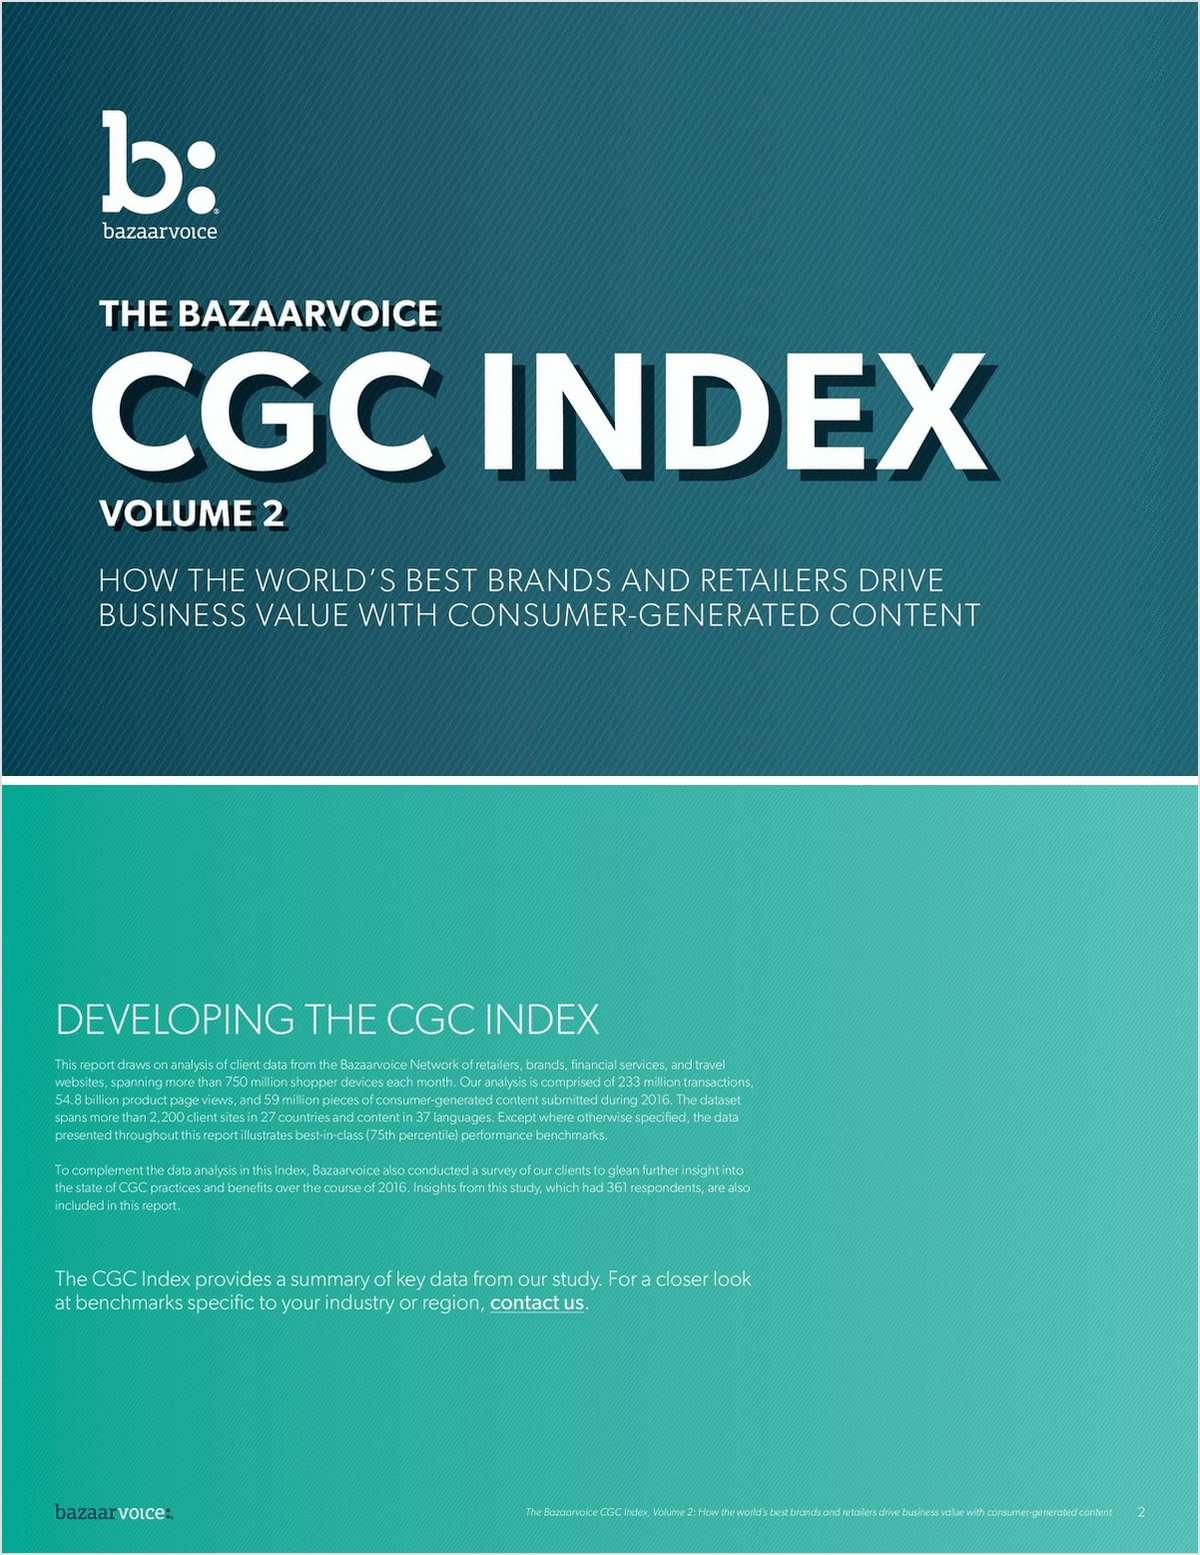 The Bazaarvoice CGC Index Volume 2